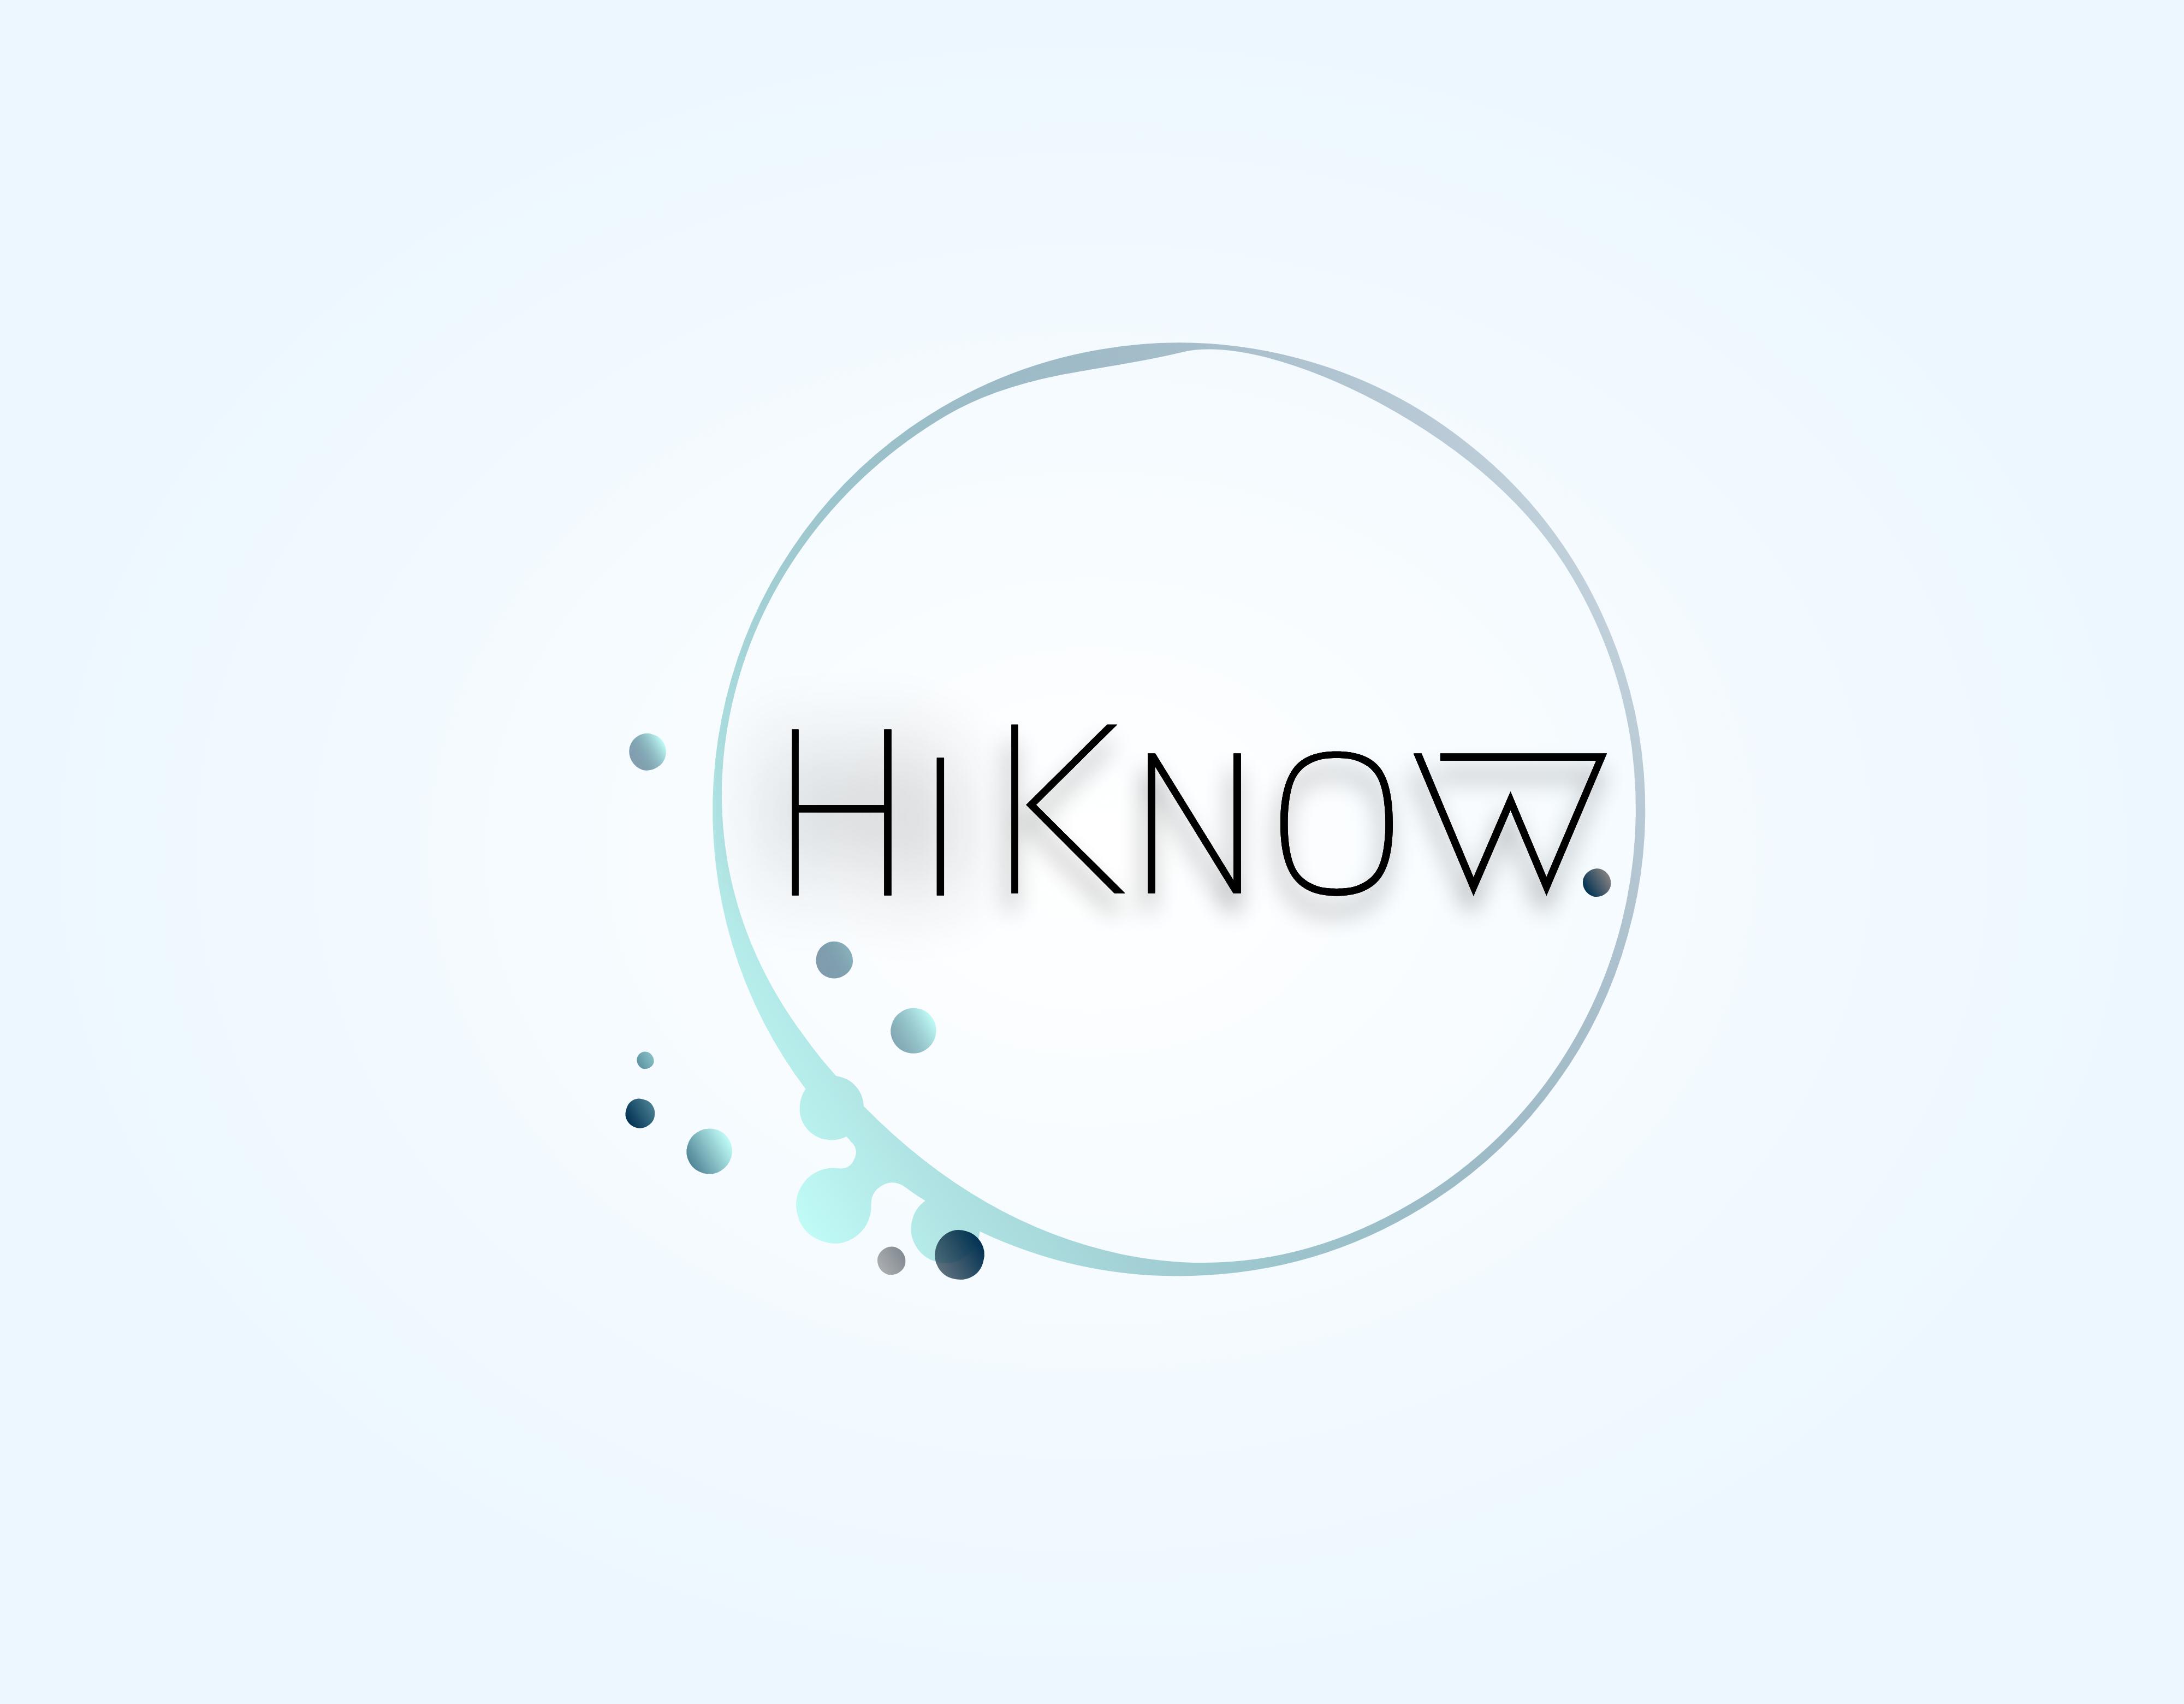 HI KNOW